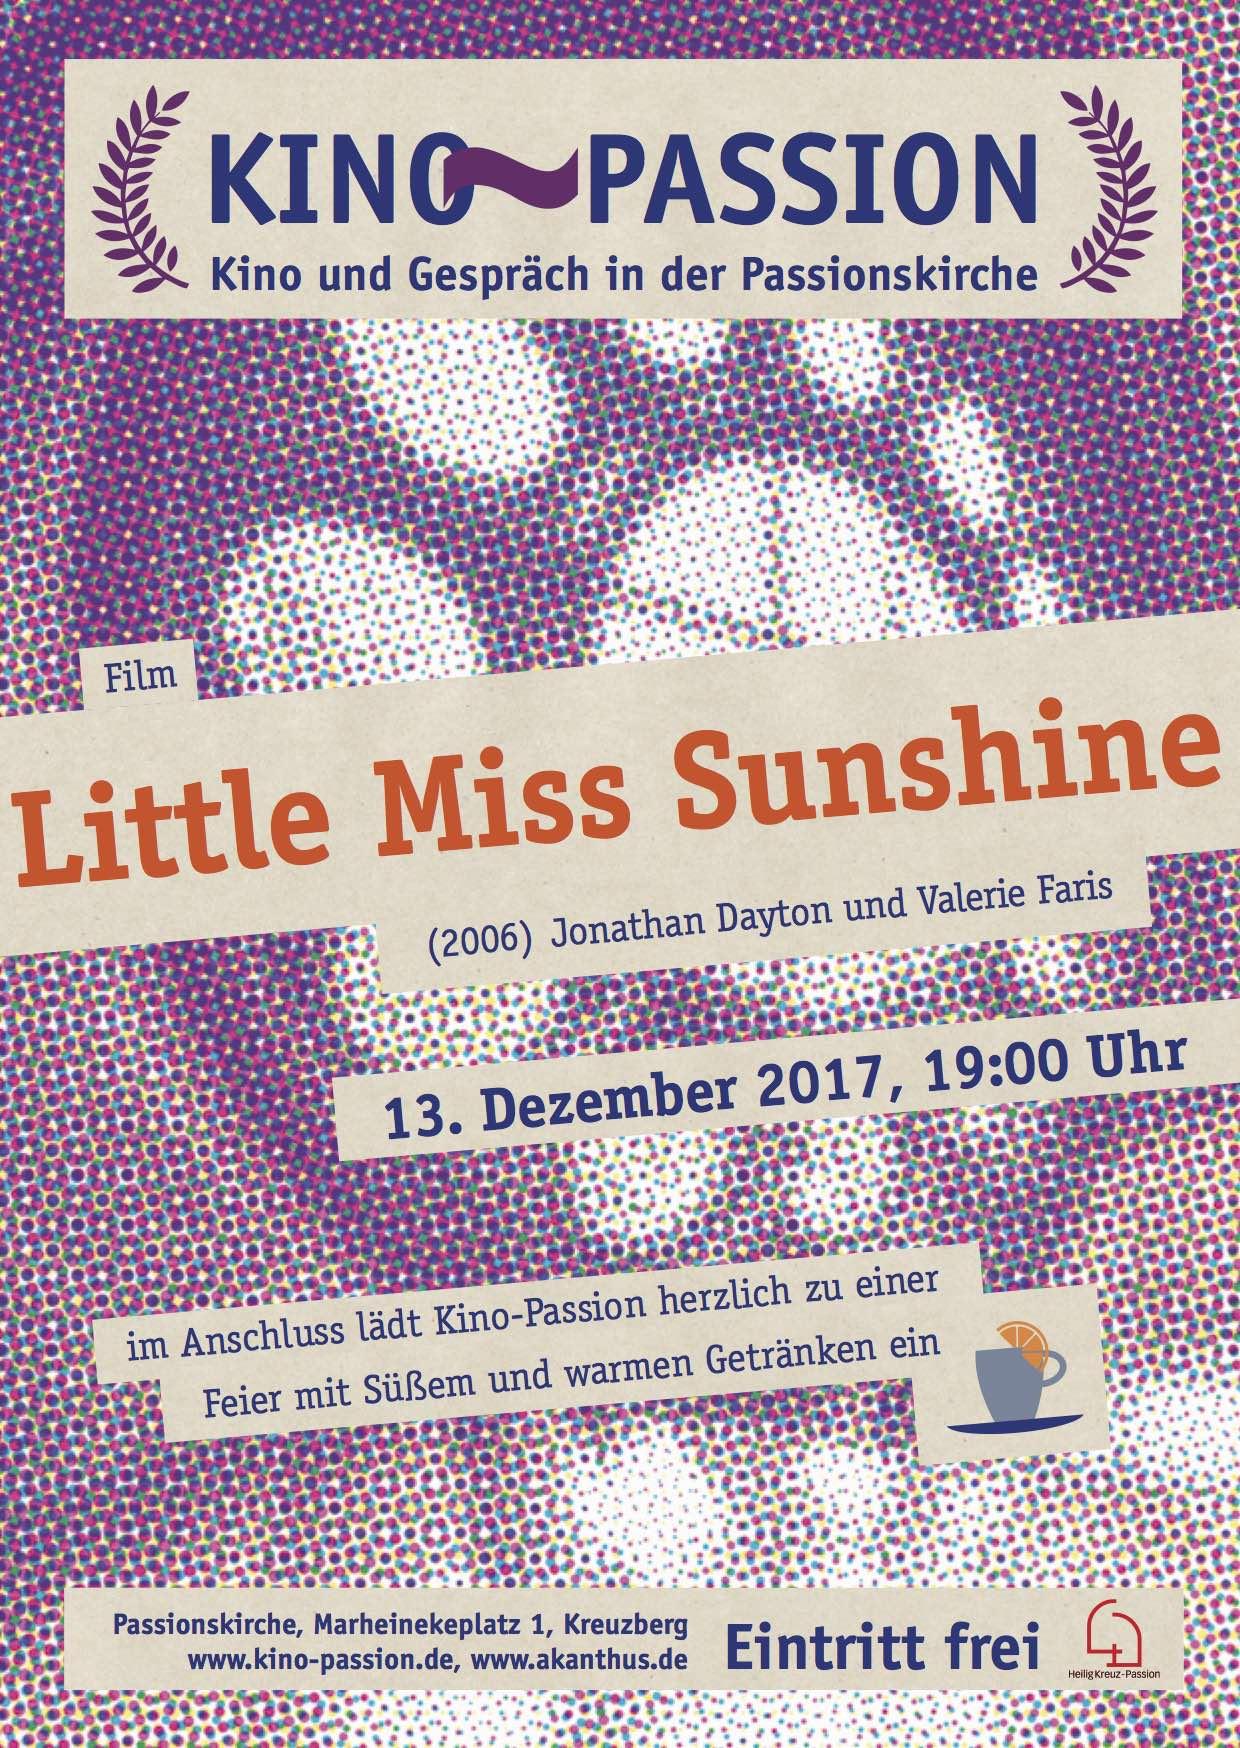 66_Kino_Passion_Little Mis Sunshine.jpg